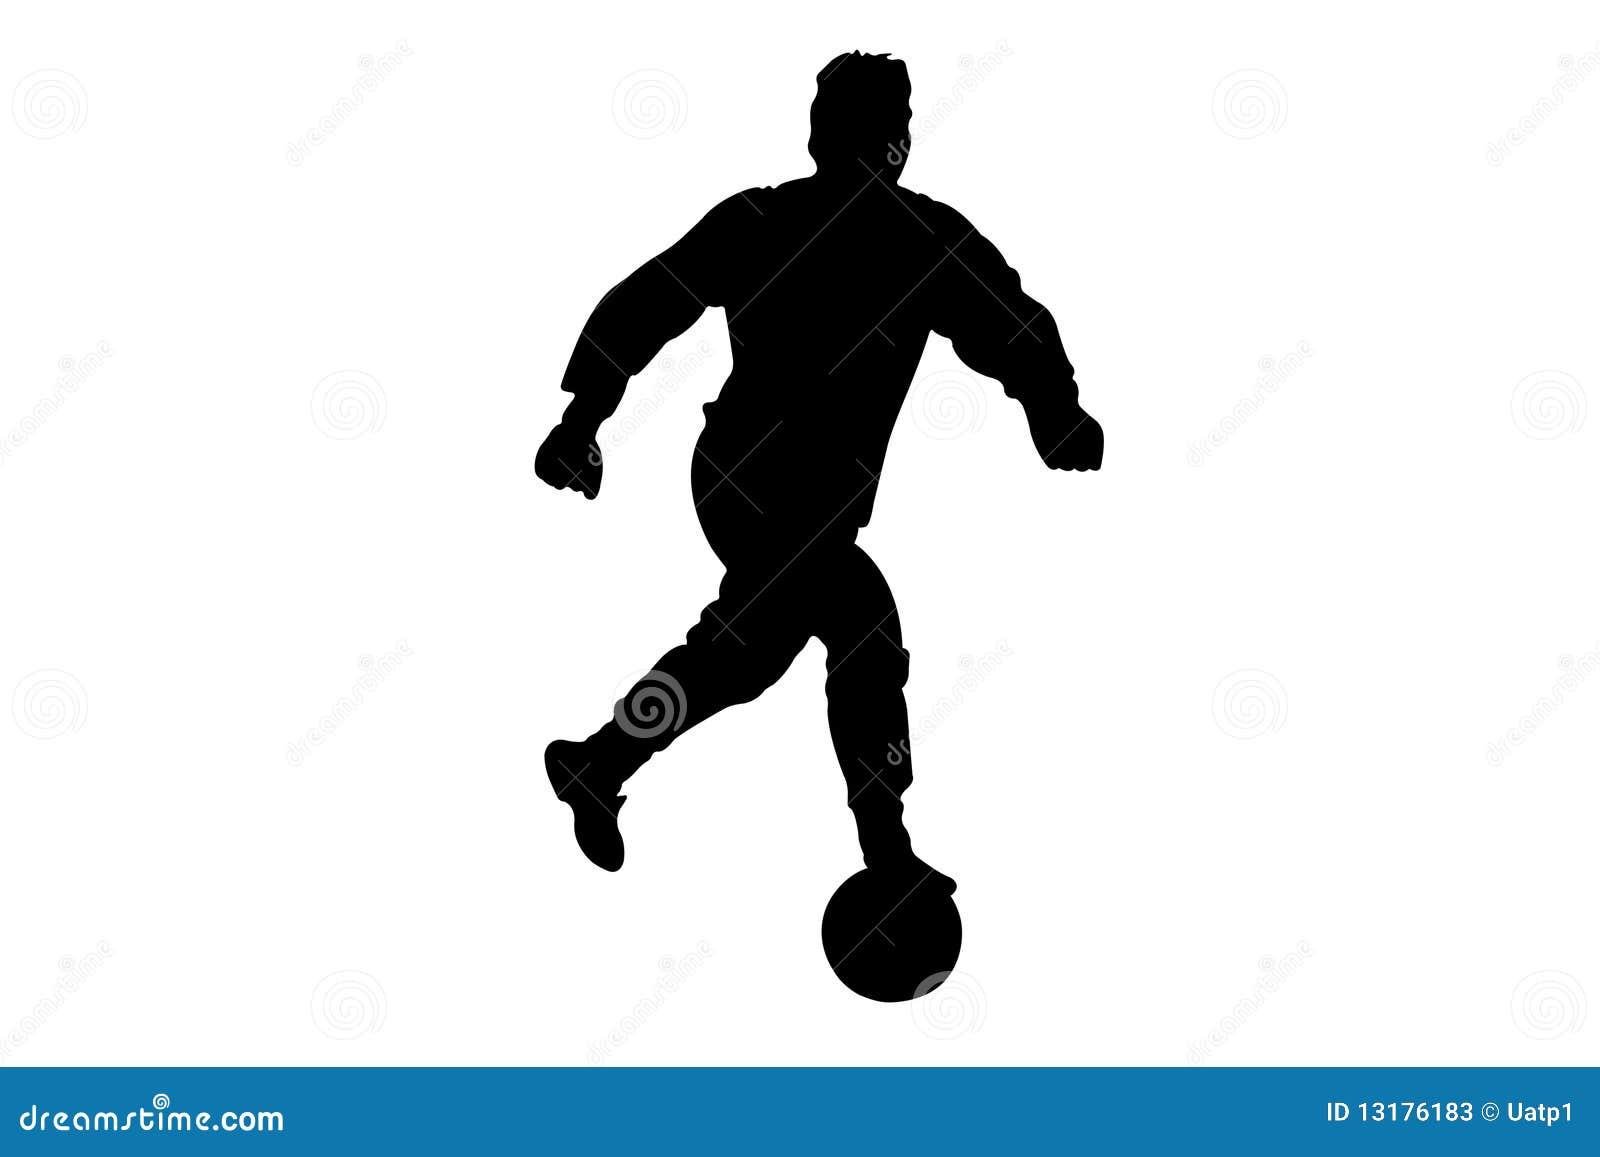 Футболист рисунок